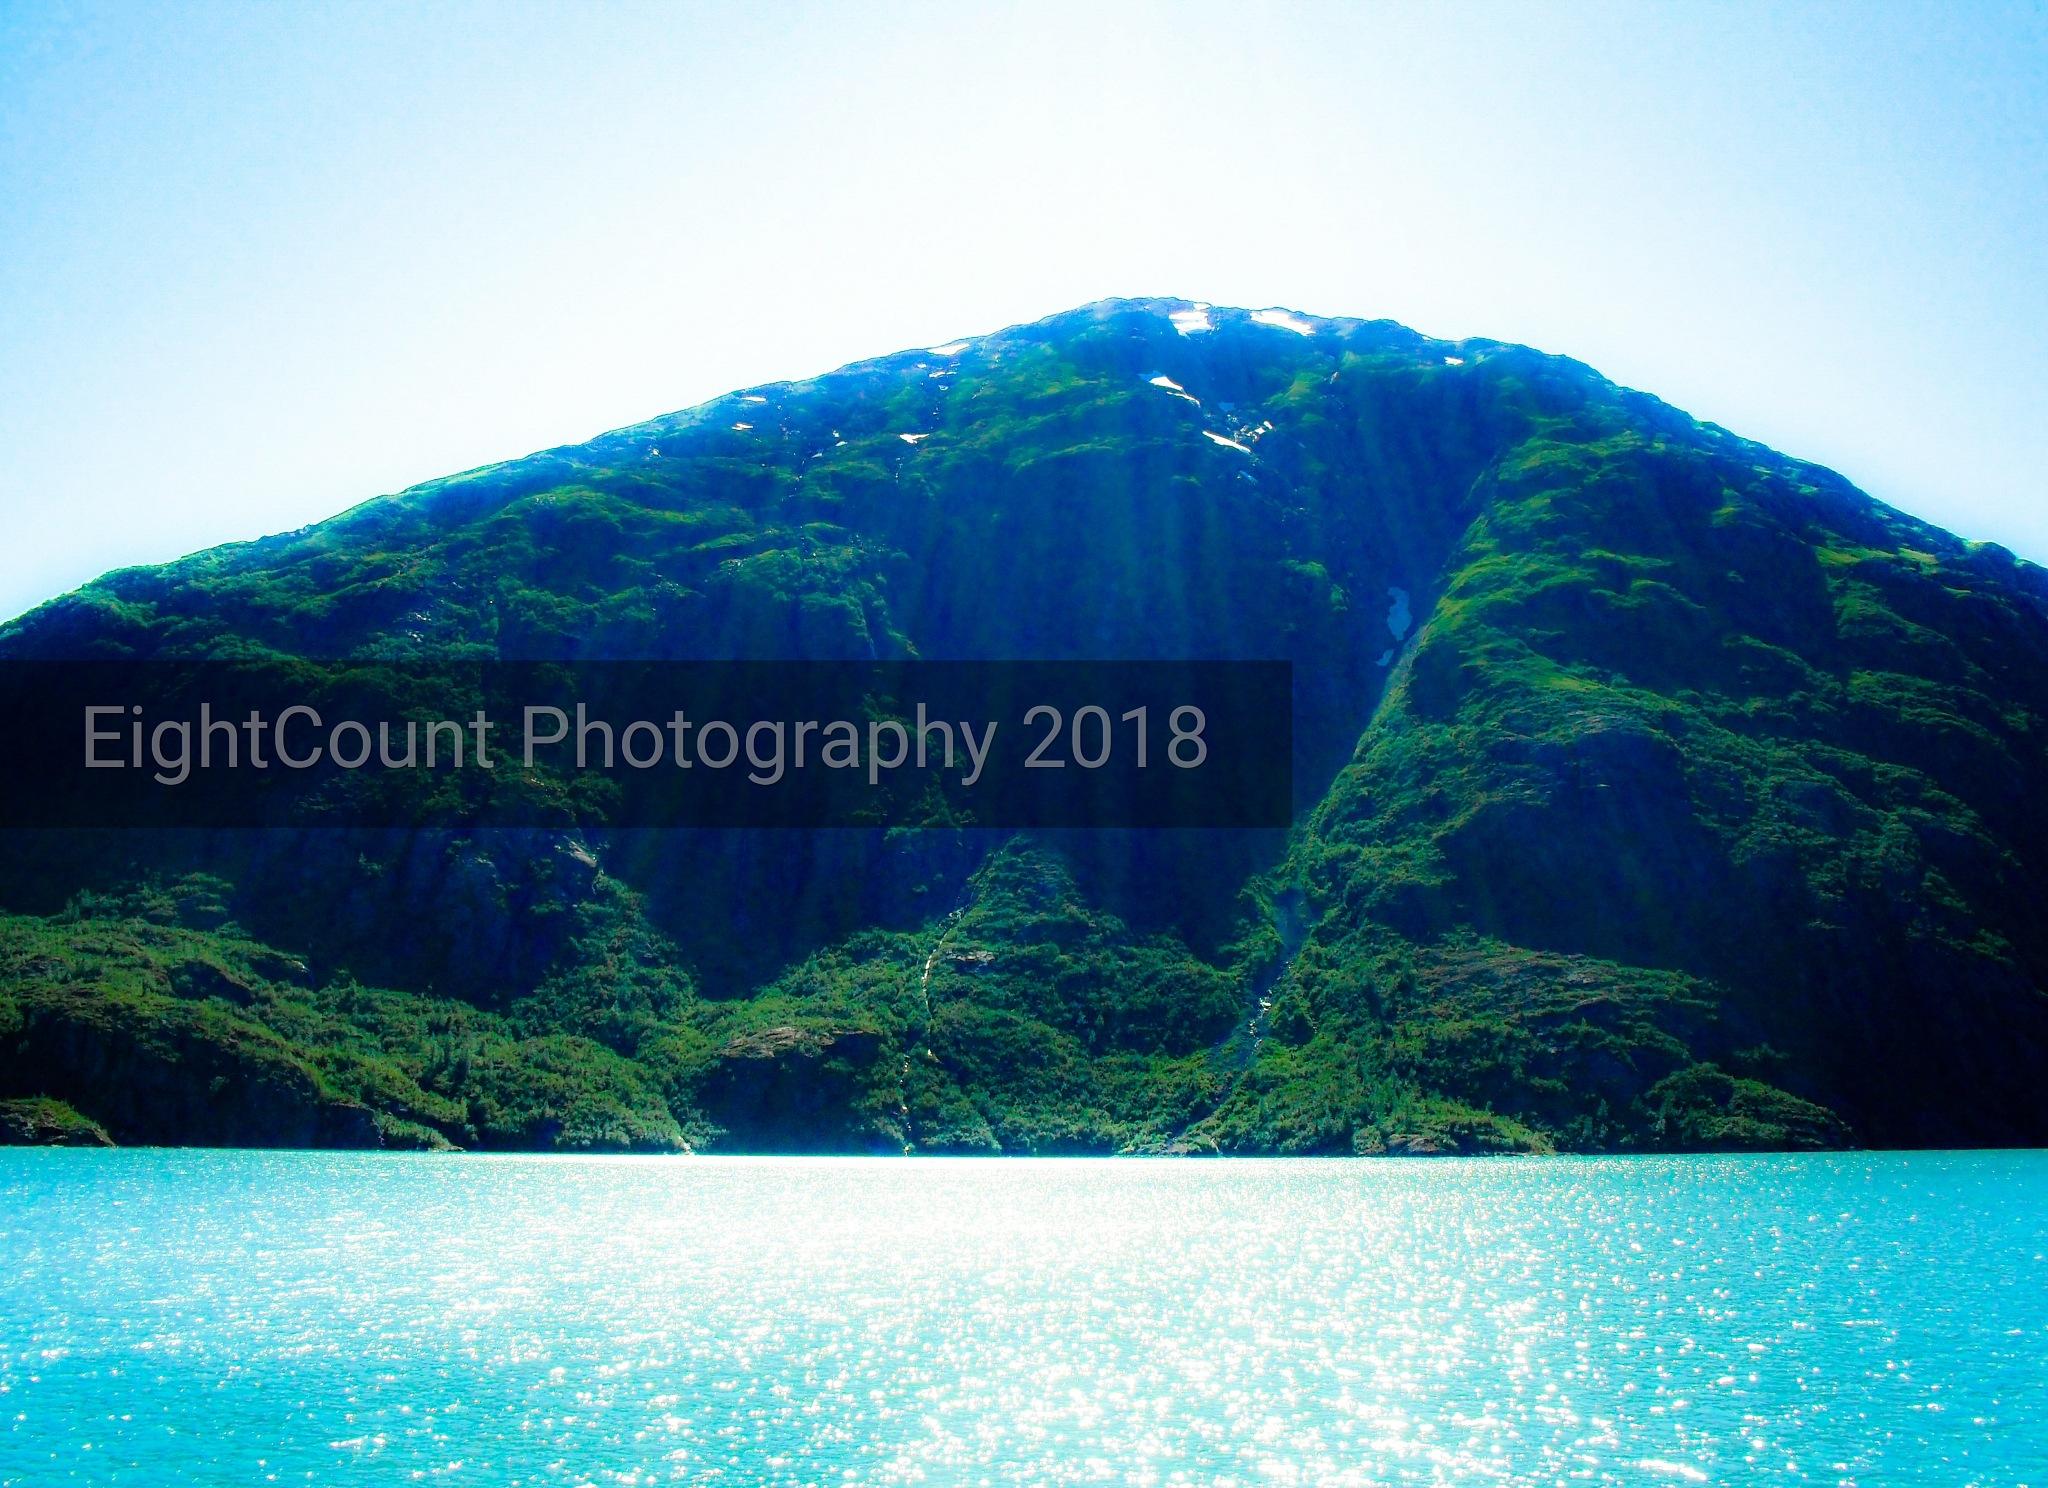 Big Light, Beautiful Mountain  by EightCount Photography